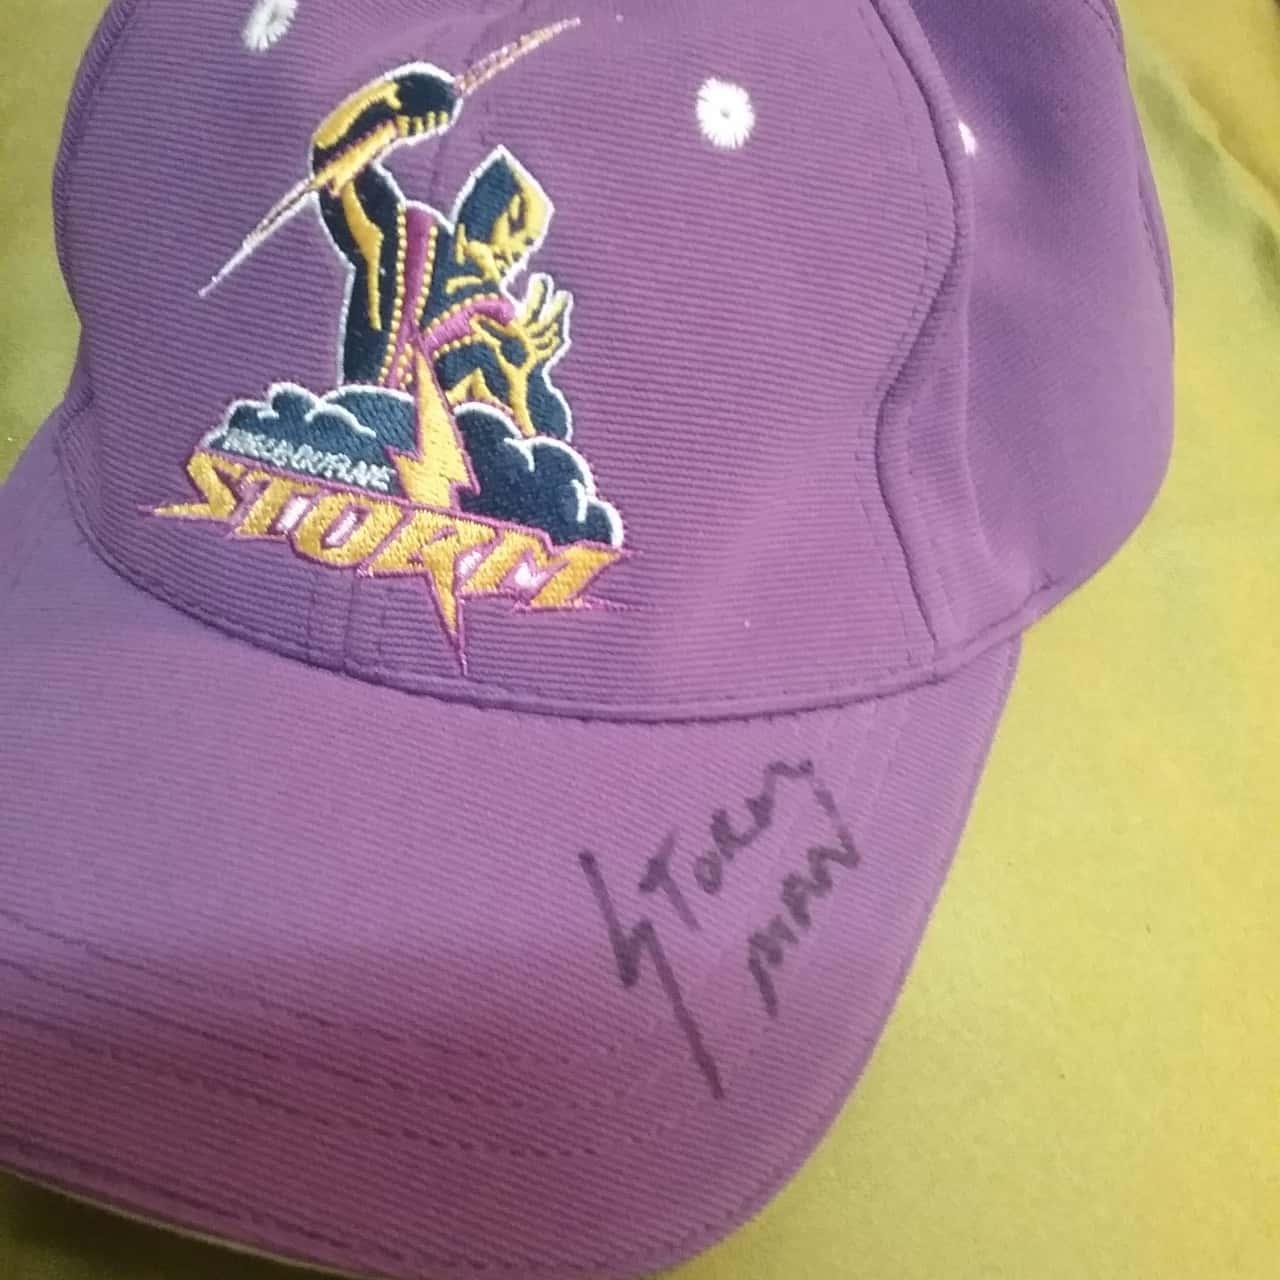 Melbourne Storm member cap signed by Storm Man unworn